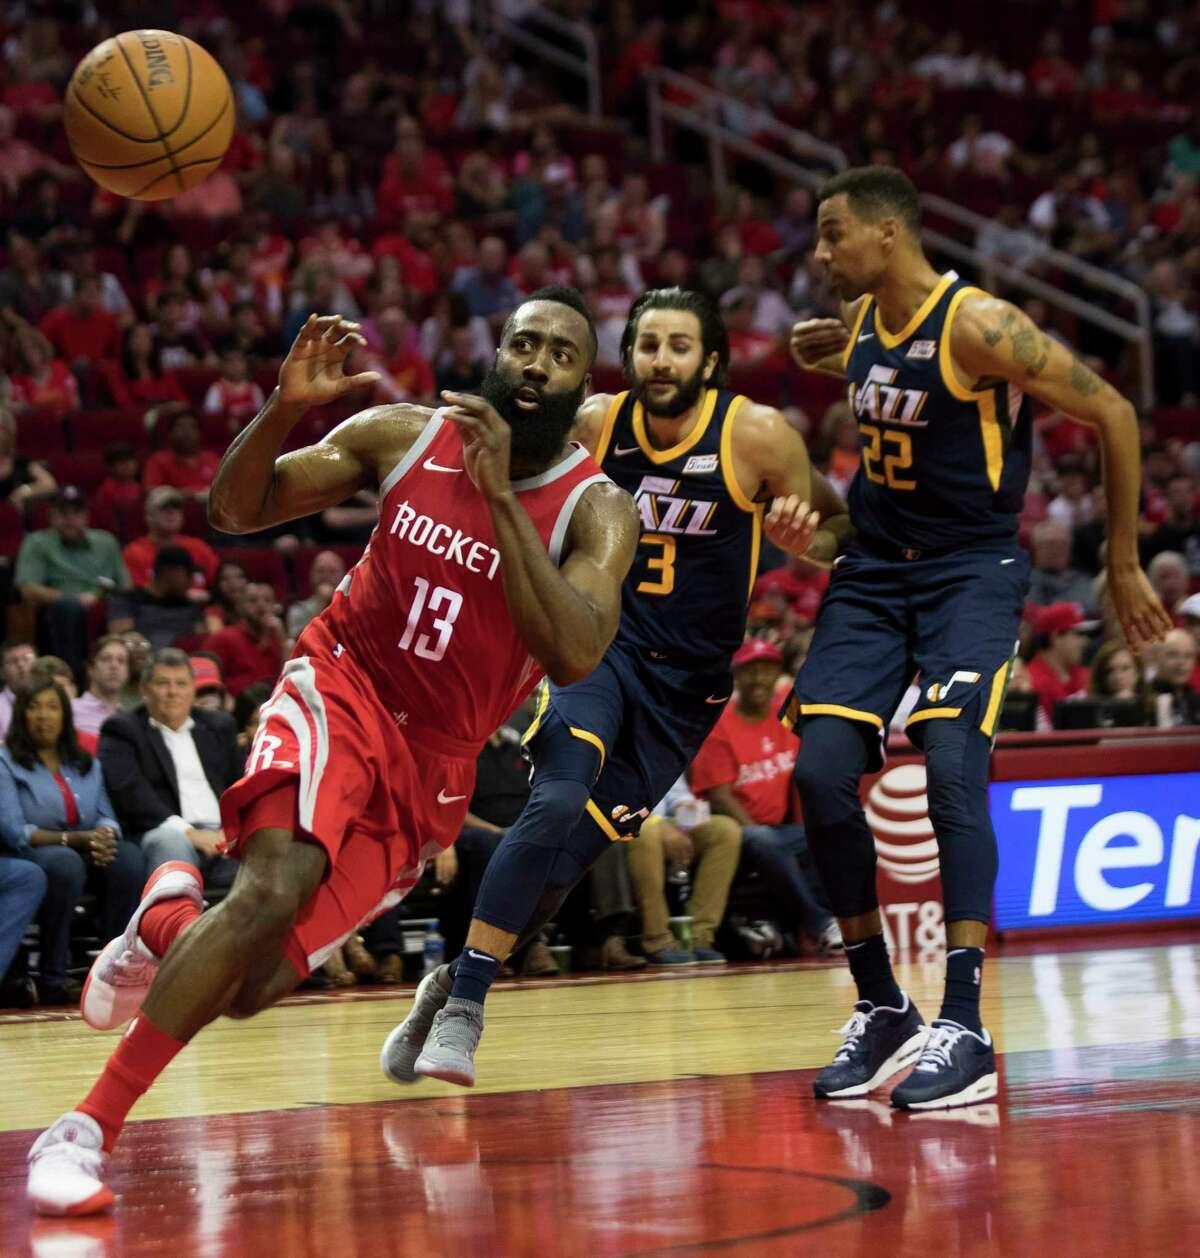 Houston Rockets guard James Harden (13) prepares to catch a pass under the pressure of Utah Jazz guard Ricky Rubio (3) and Utah Jazz forward Thabo Sefolosha (22) on Sunday, Nov. 5, 2017, at the Toyota Center in Houston. ( Marie D. De Jesus / Houston Chronicle )